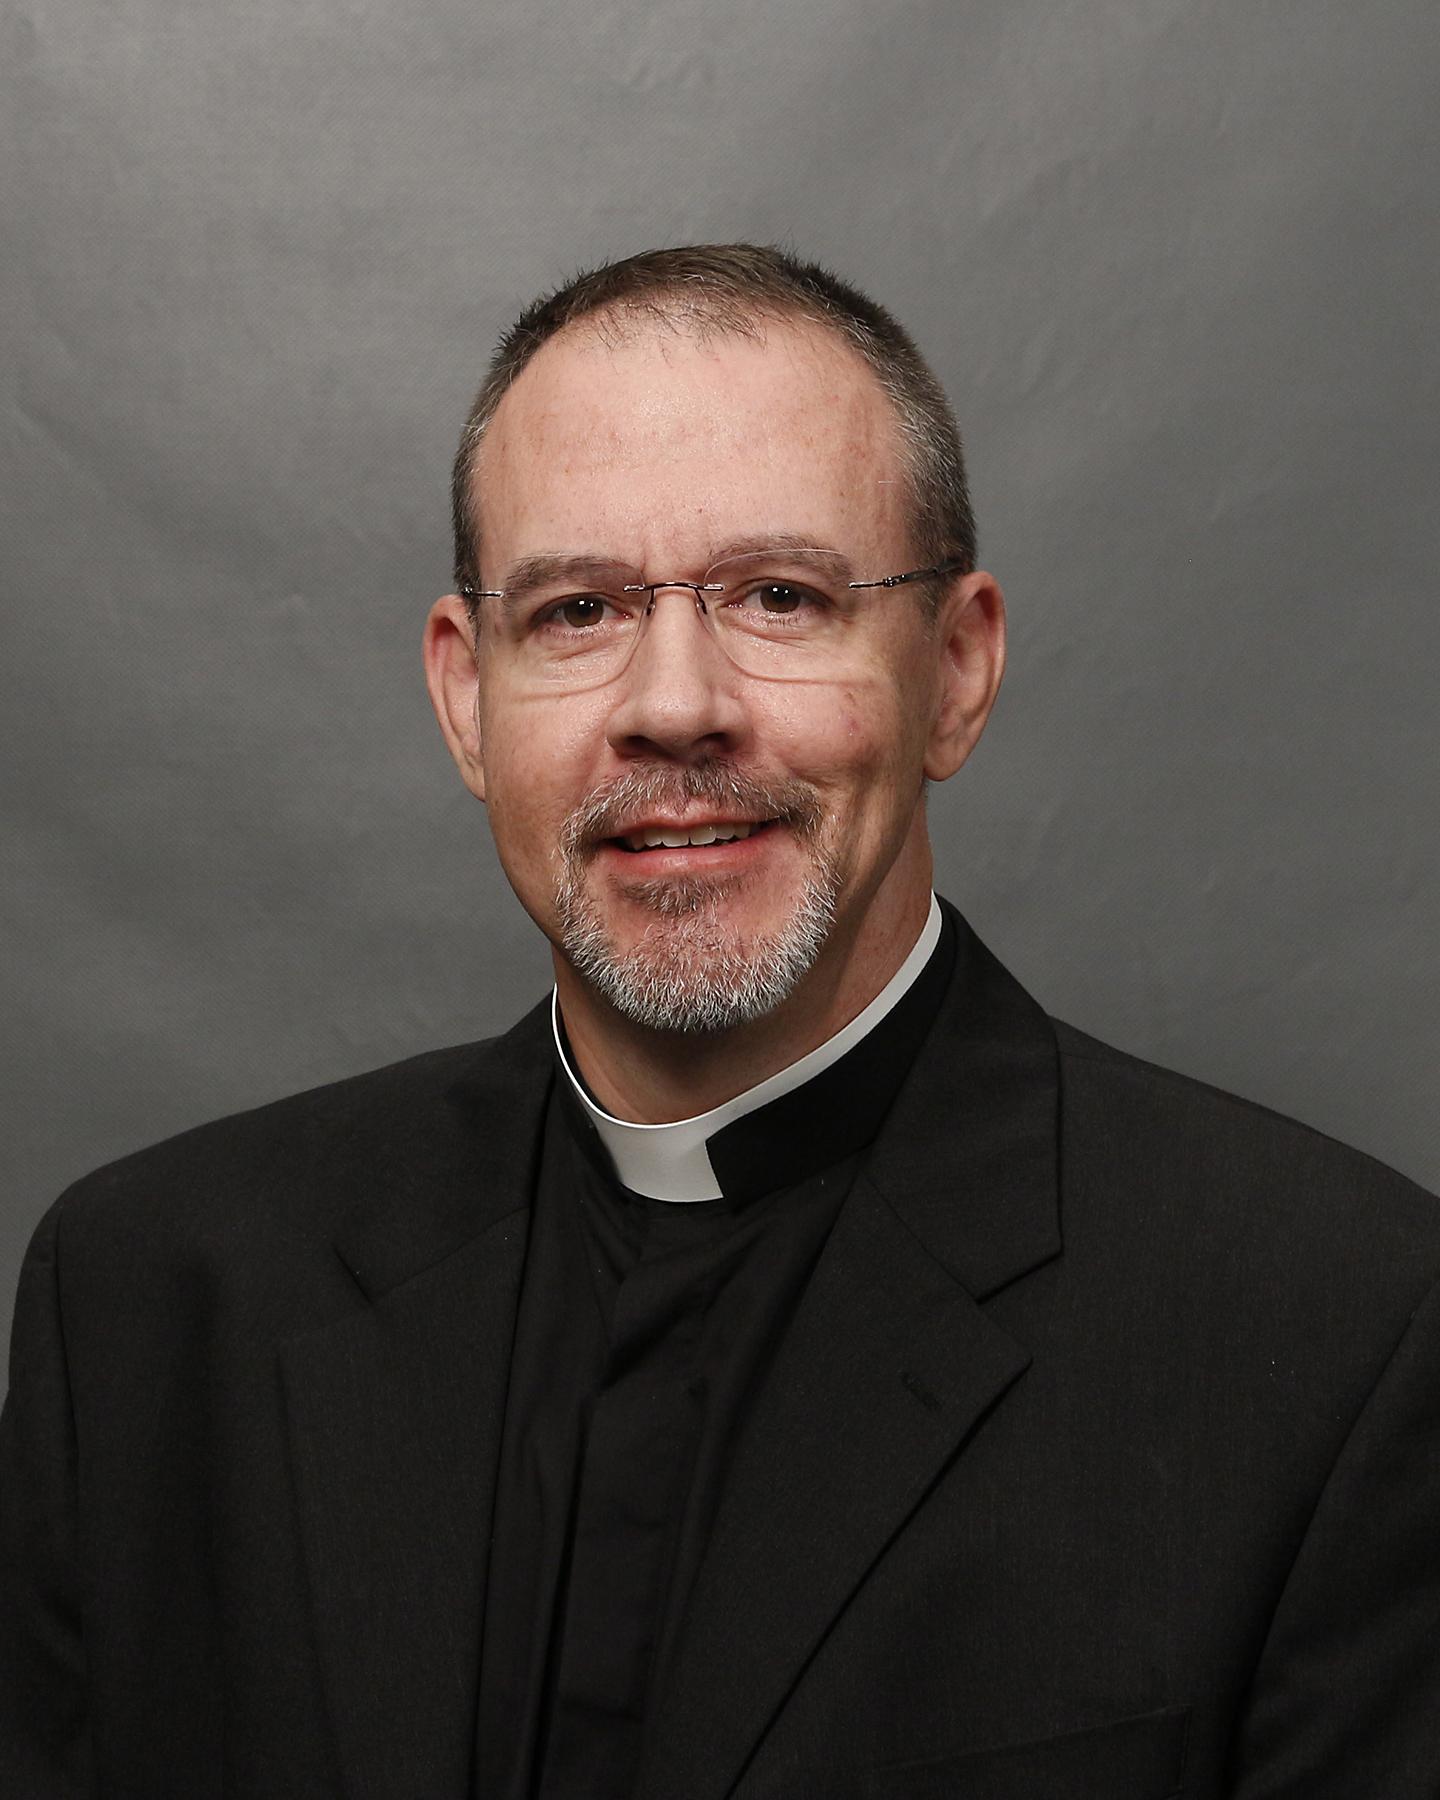 Rev. Brian Stark